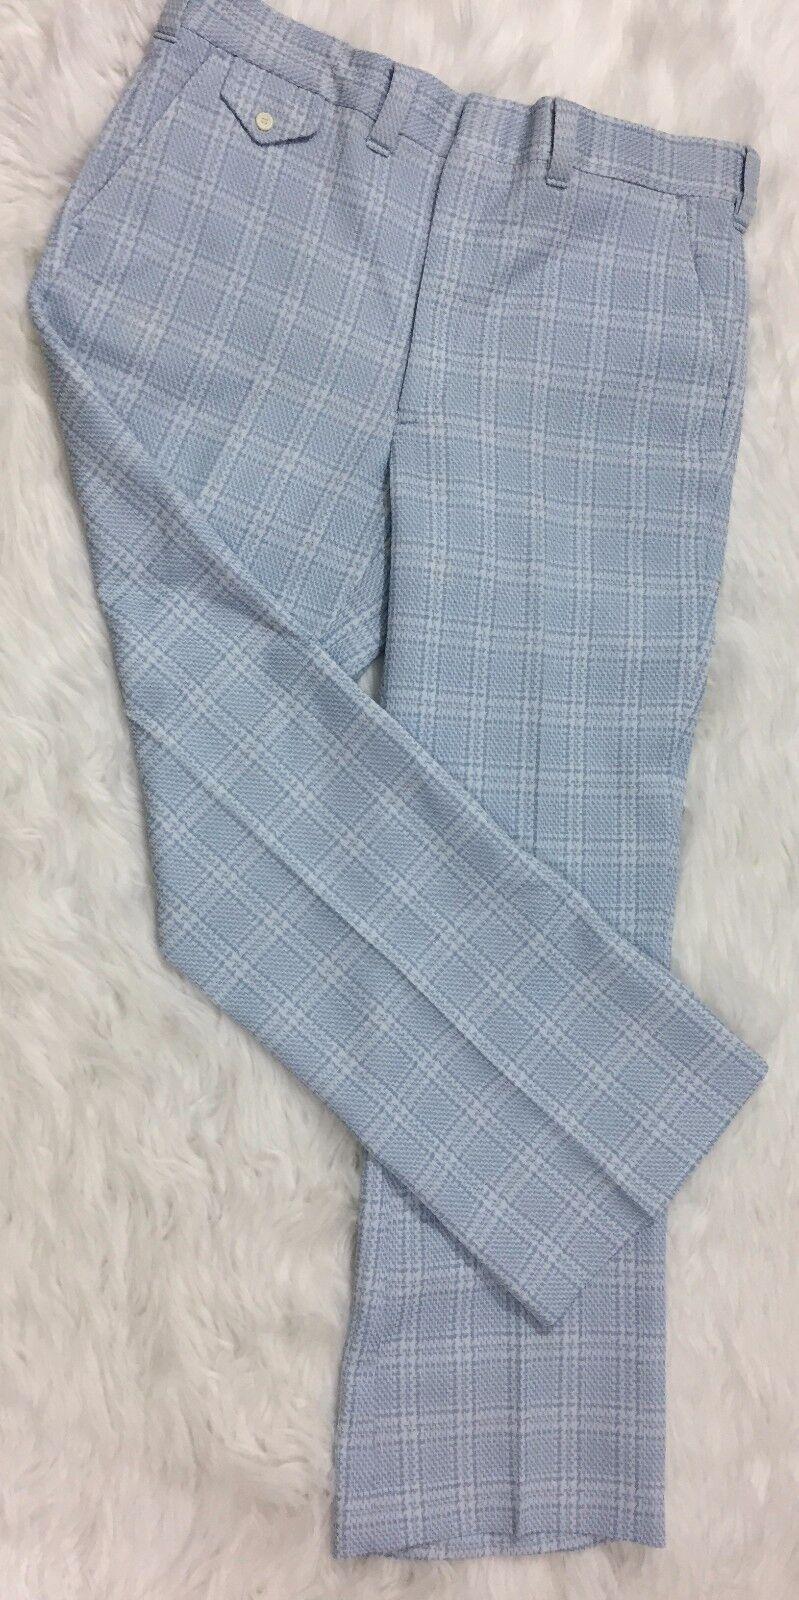 Vintage Sears Slim Fit NWT bluee Plaid 1970's Pant Size 36 Short Groovy Hippy Lg